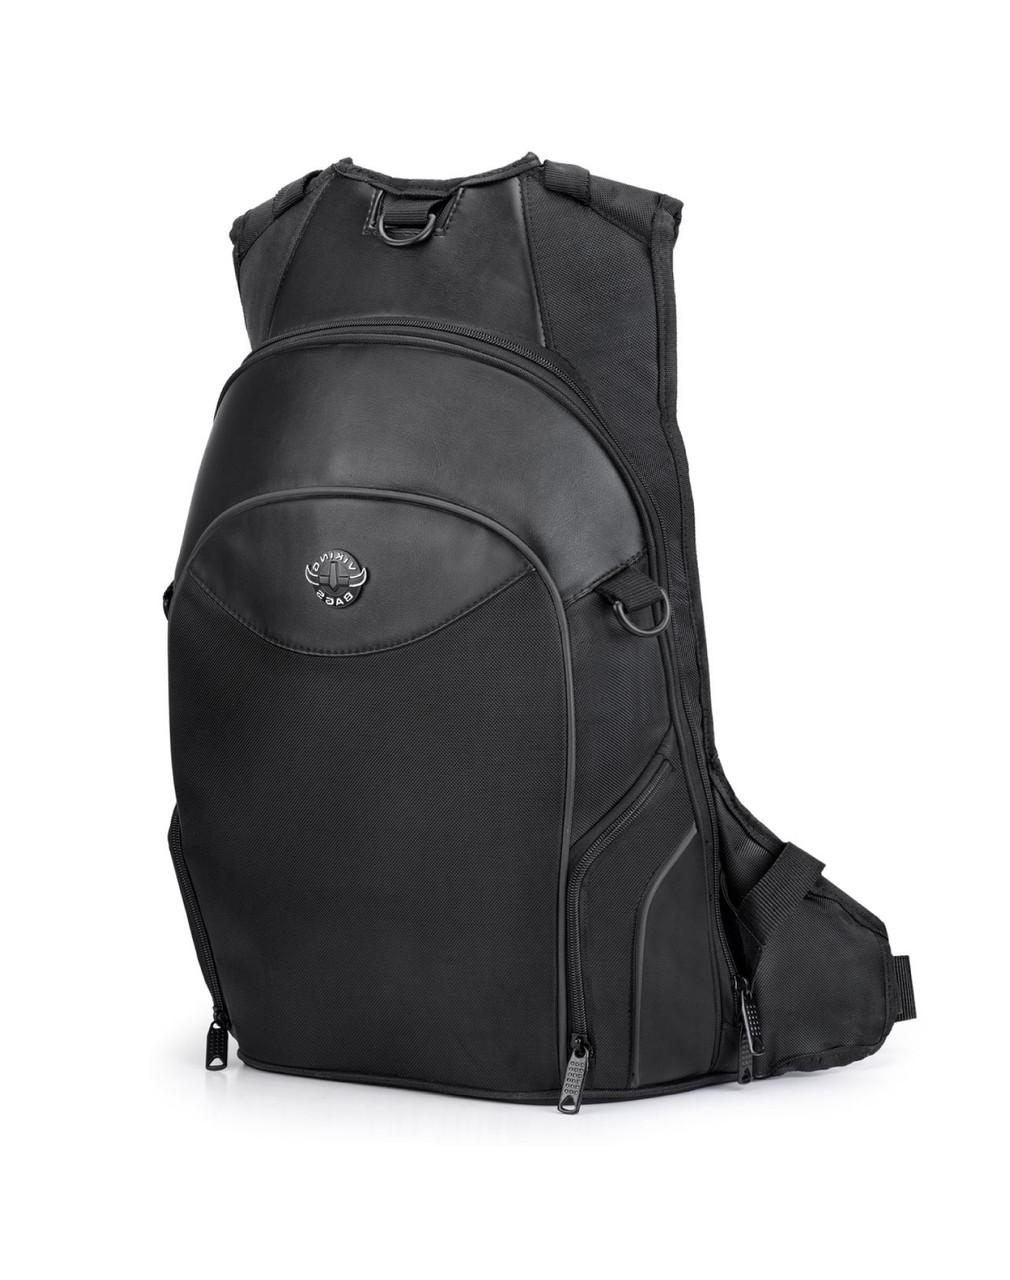 Viking Medium Black Street/Sportbike Backpack Main View